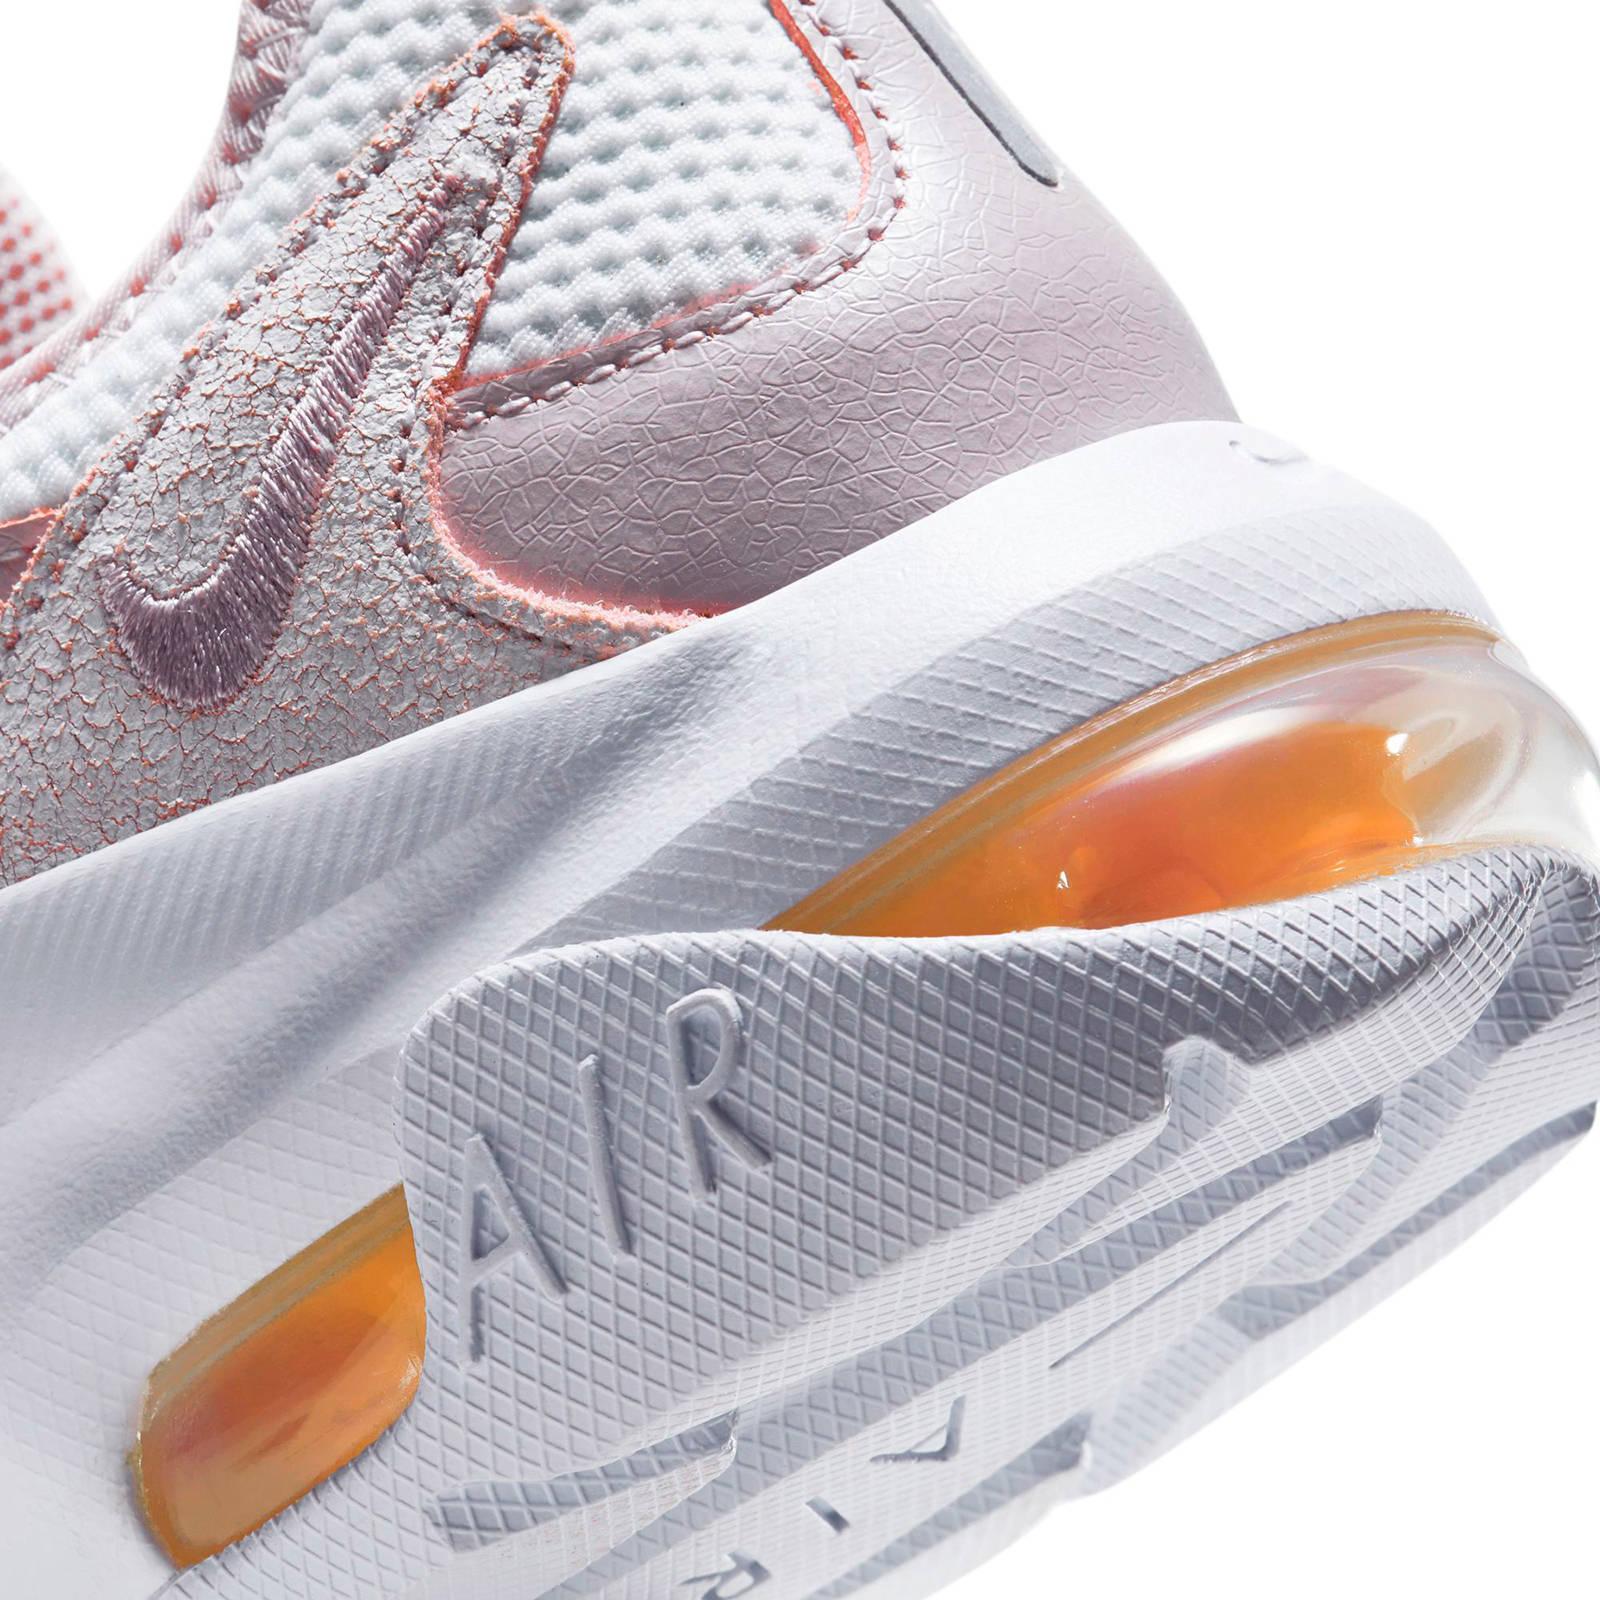 Air Max Graviton leren sneakers roze/wit